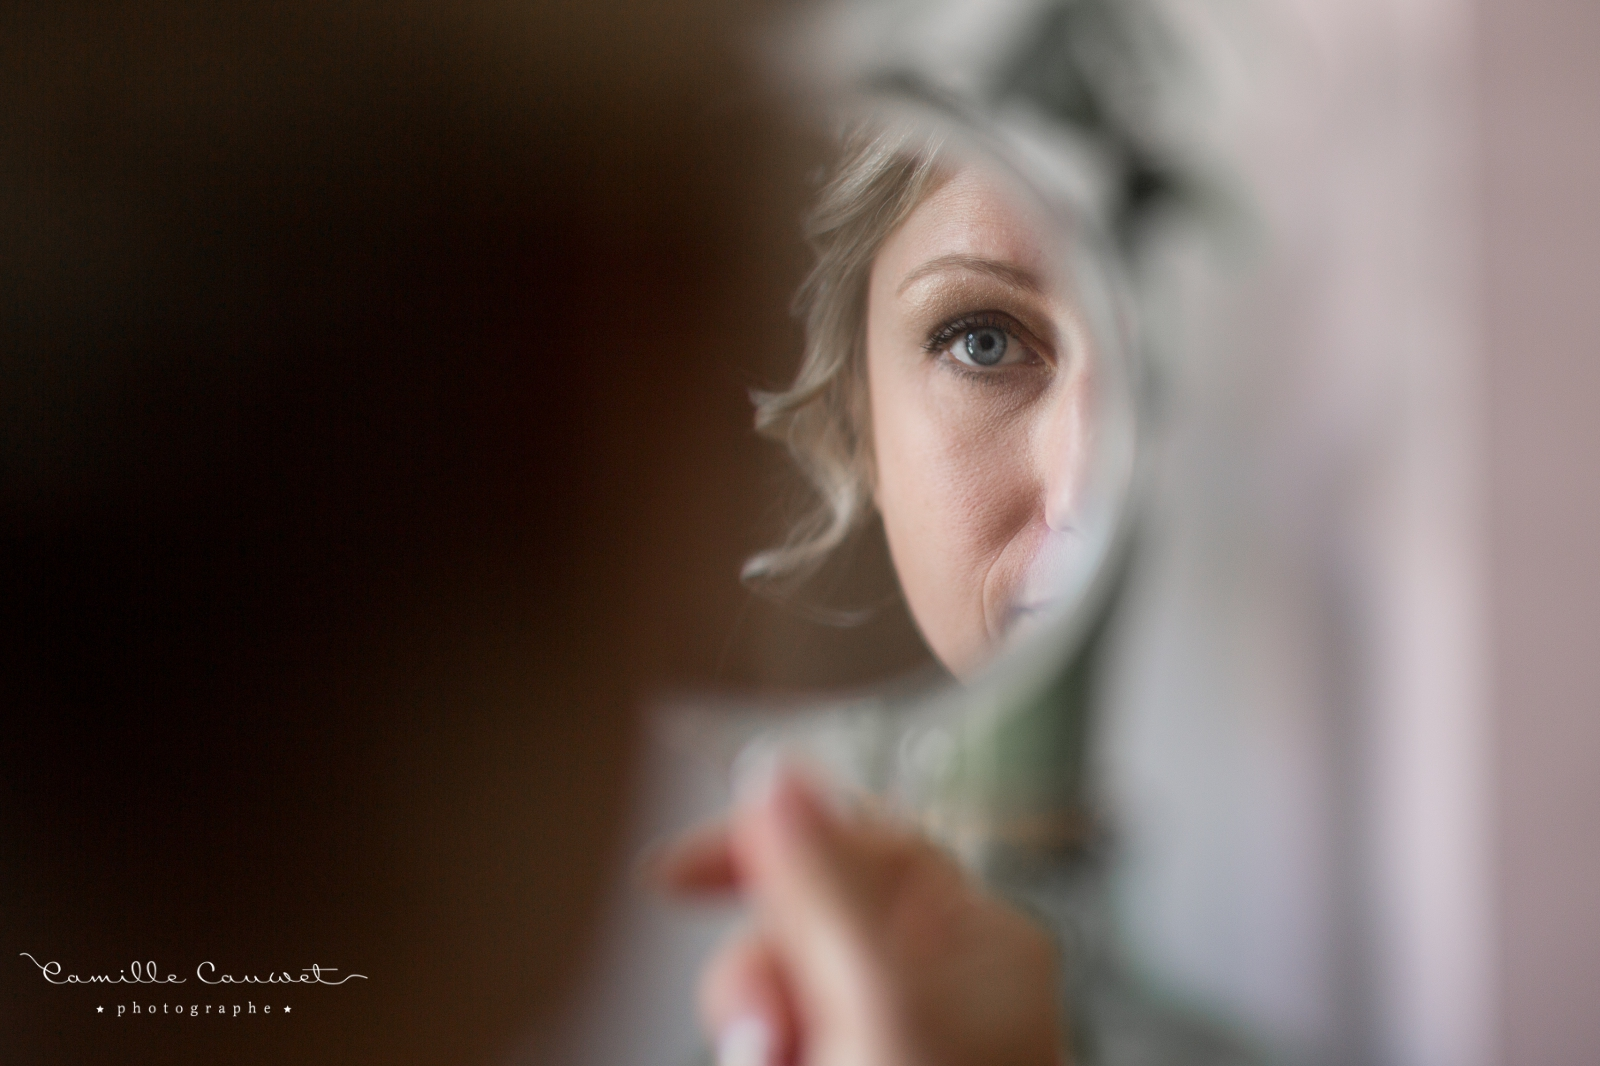 camille cauwet photographe mariage 77 preparatifs